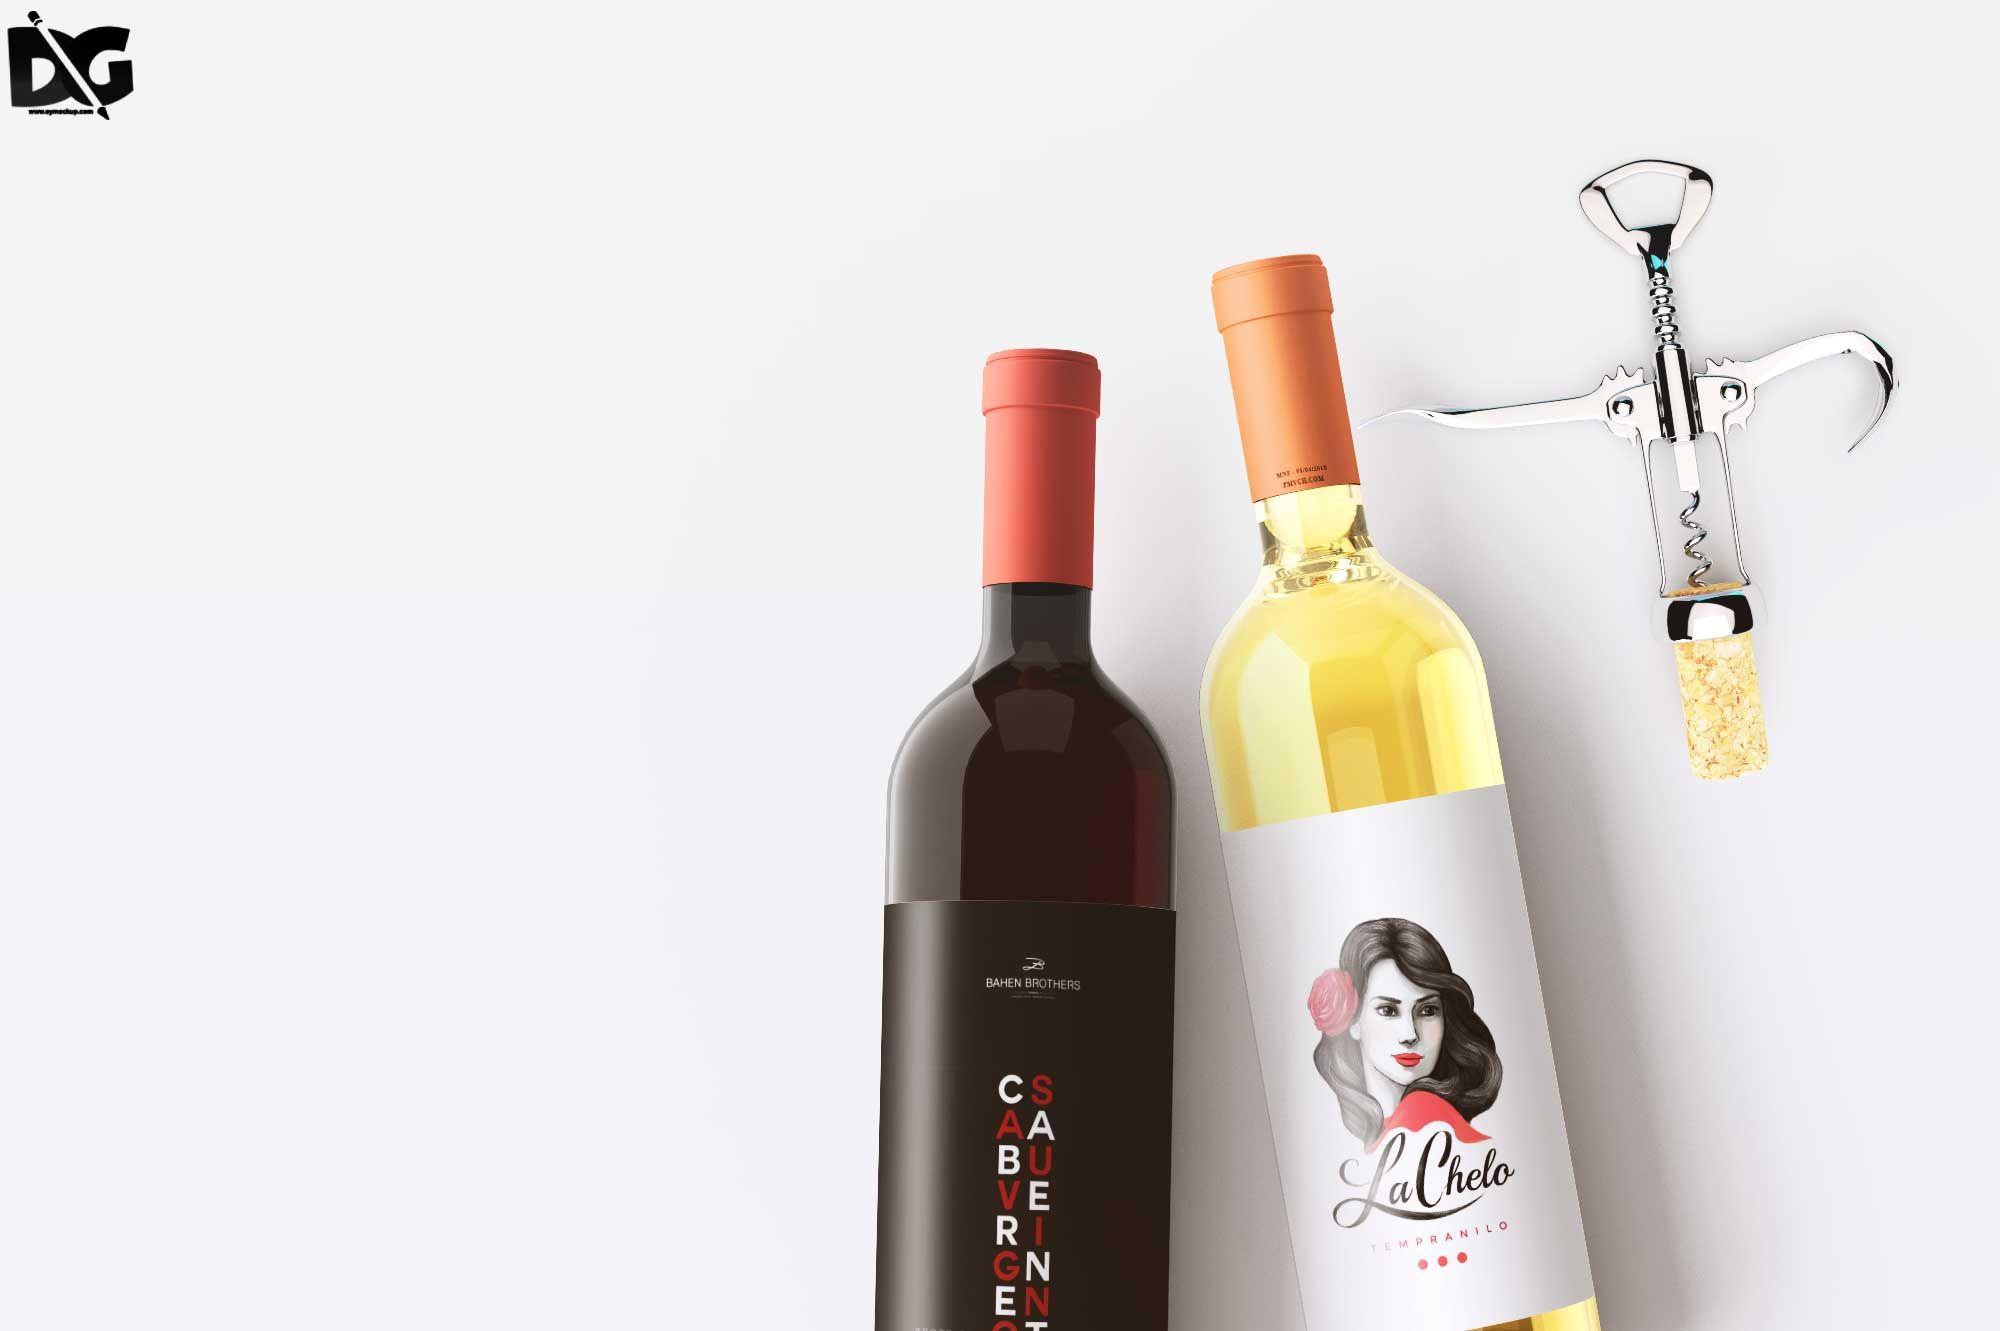 Download Realistic Wine Bottle Psd Label Mockup Branding Download Downloadpsd Free Freemockup Freepsd Freebie Mock Up Mockuppsd Psd Wine Bottle Bottle Mockup